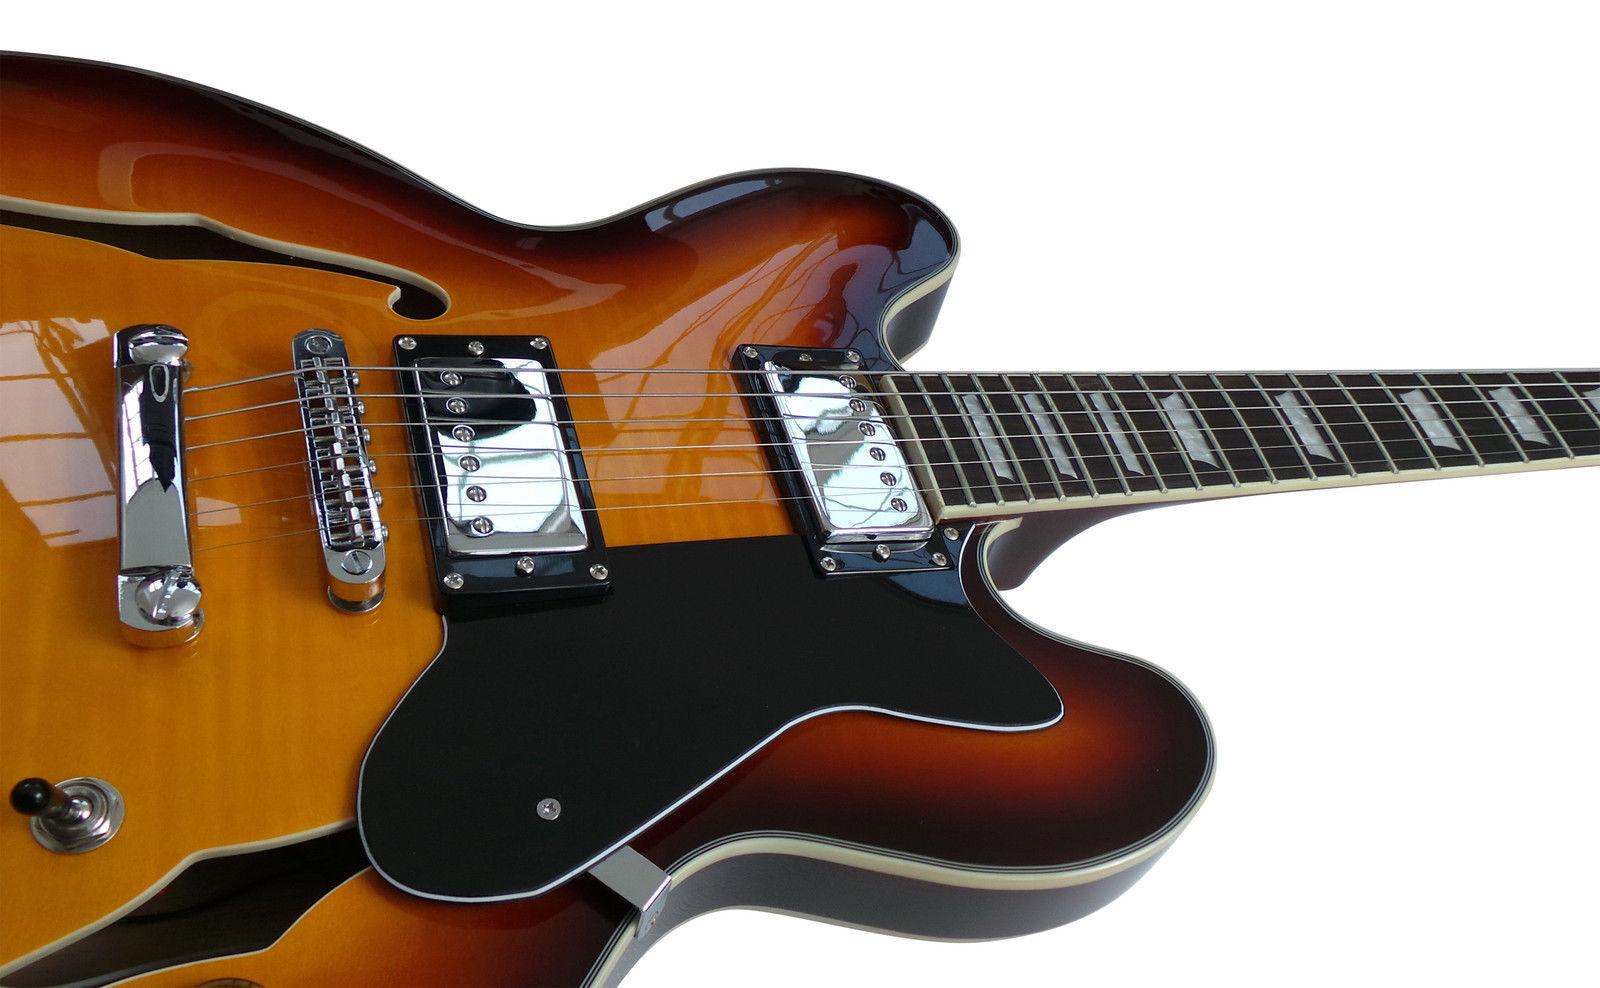 ES335 Semi Guitarra Eléctrica Jazz azuls país HasGuitar HasGuitar HasGuitar RH 4 4 Completo  Vuelta de 10 dias